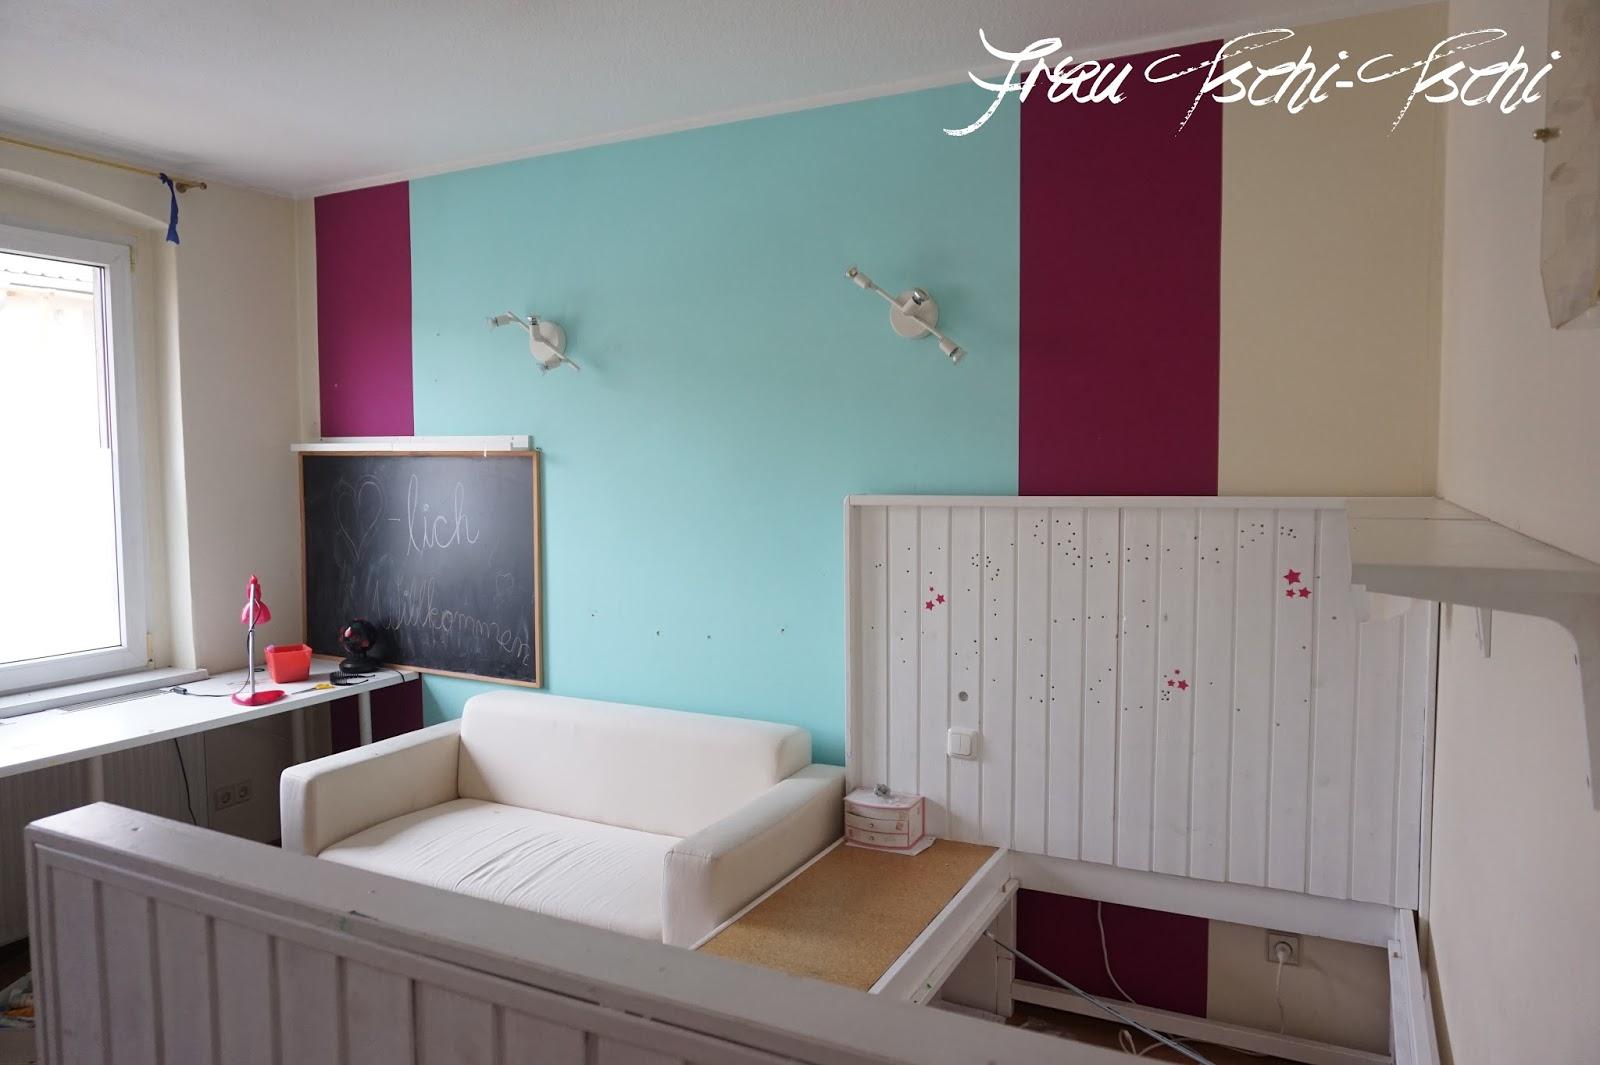 frau tschi tschi aus kinderzimmer wird teenager chillout lounge. Black Bedroom Furniture Sets. Home Design Ideas